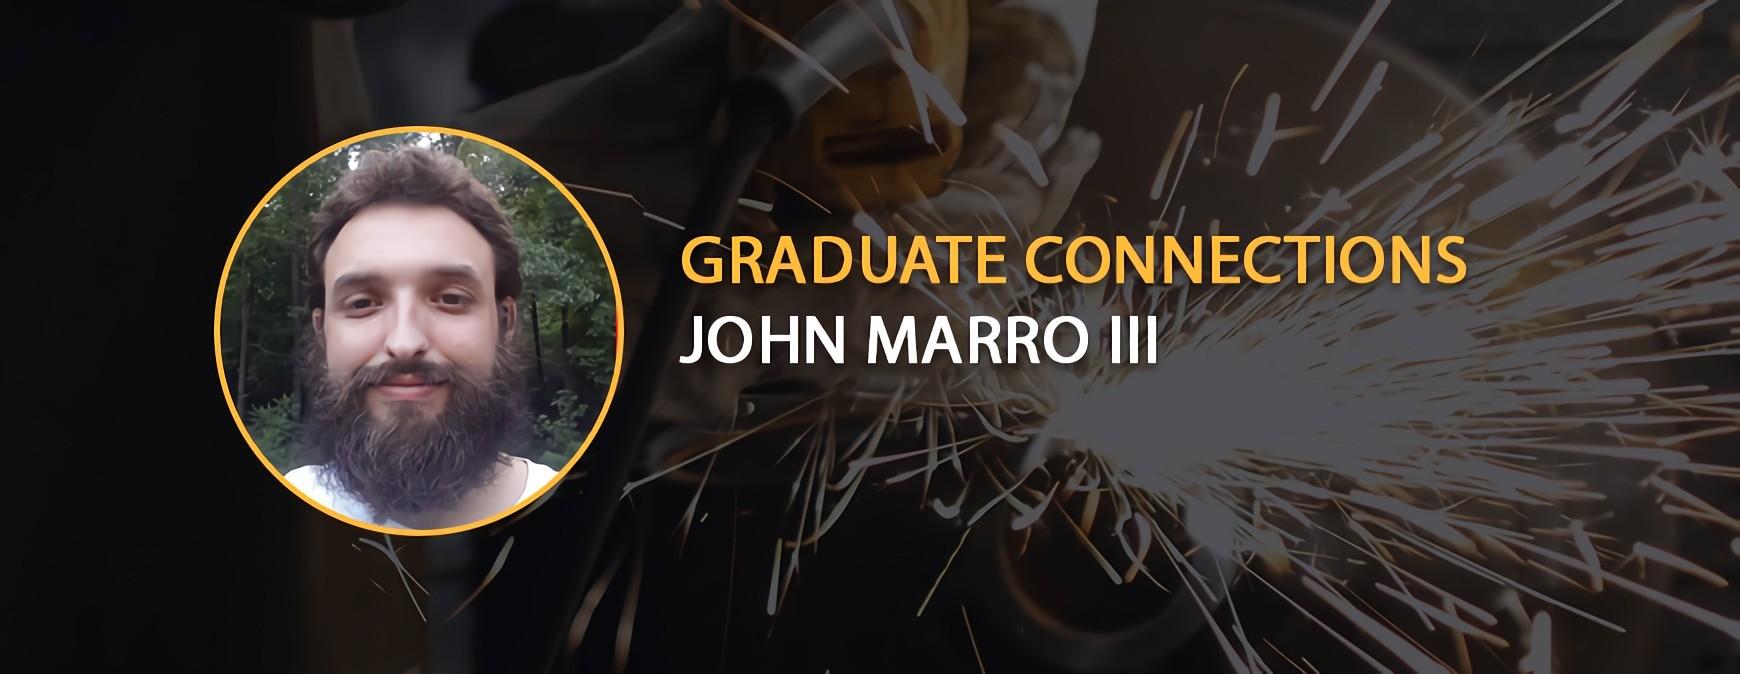 John Marro III Graduate Connections